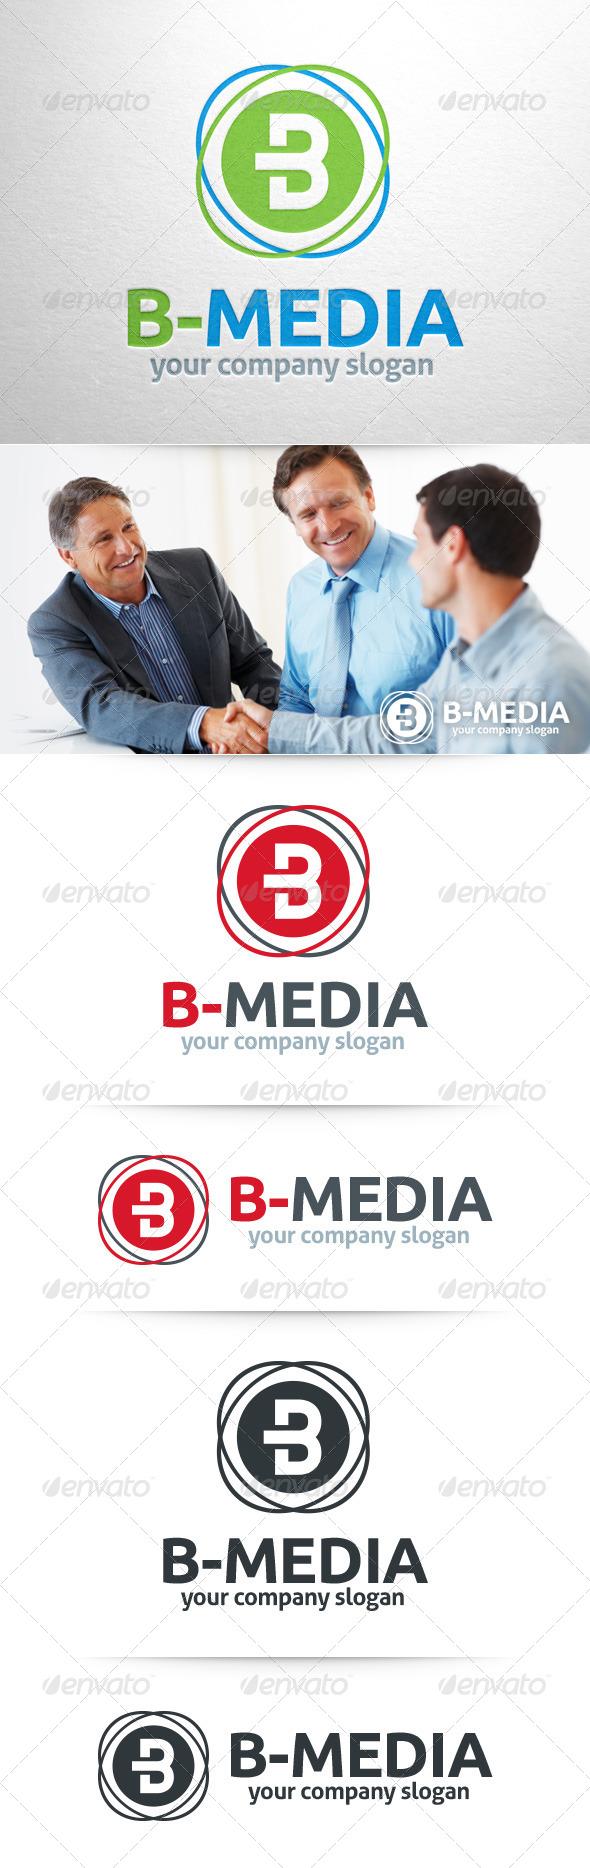 GraphicRiver B-Media Letter B Logo 8373294